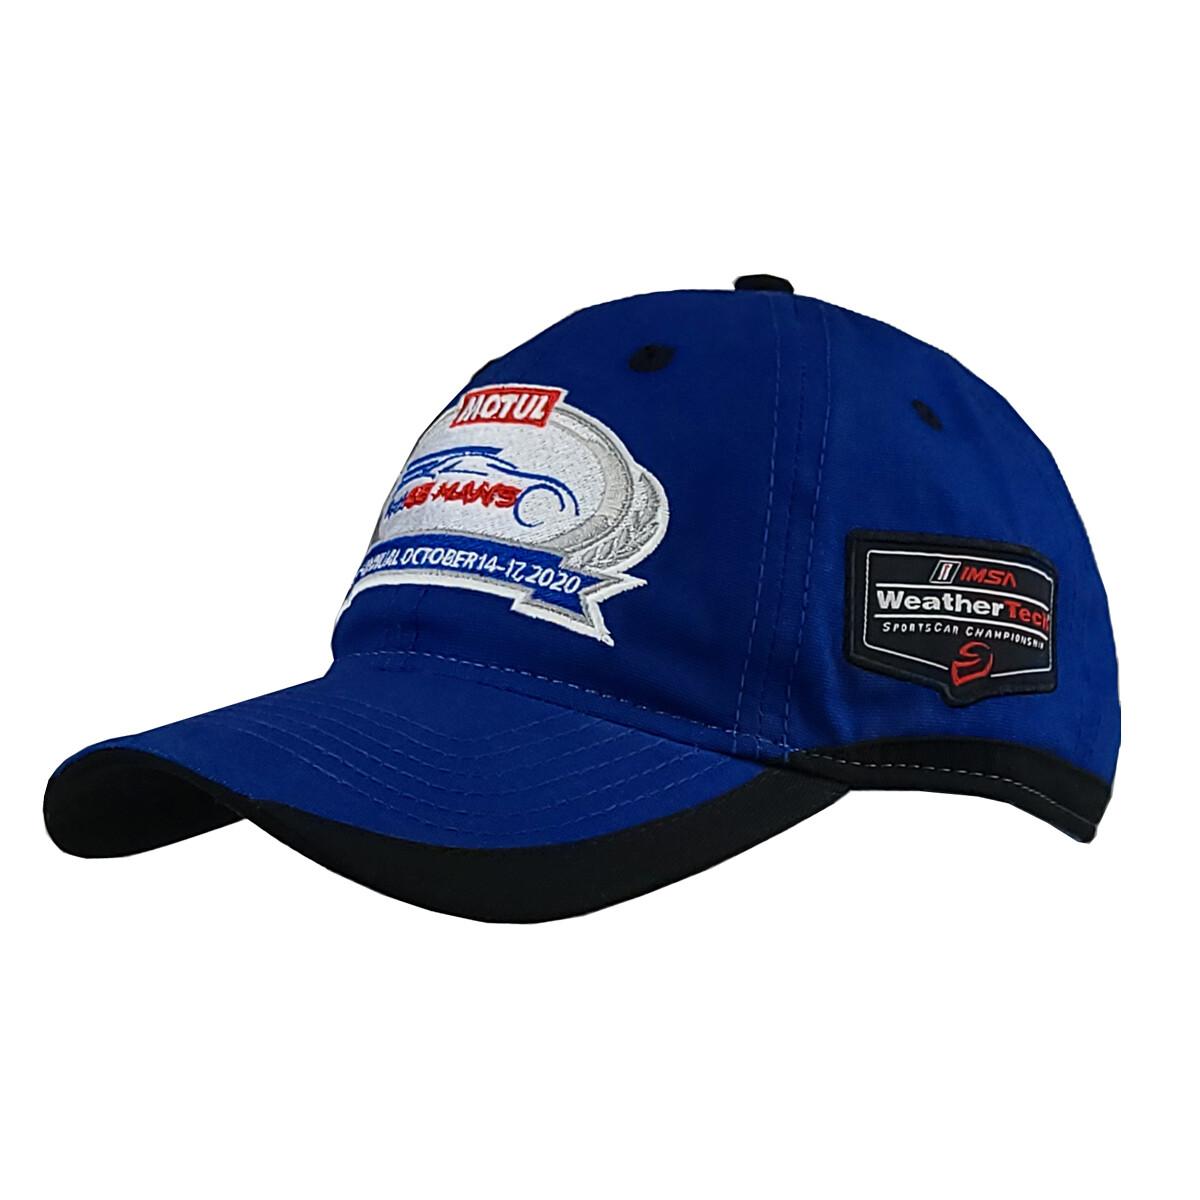 2020 Motul Petit Le Mans Hat - Royal/Black